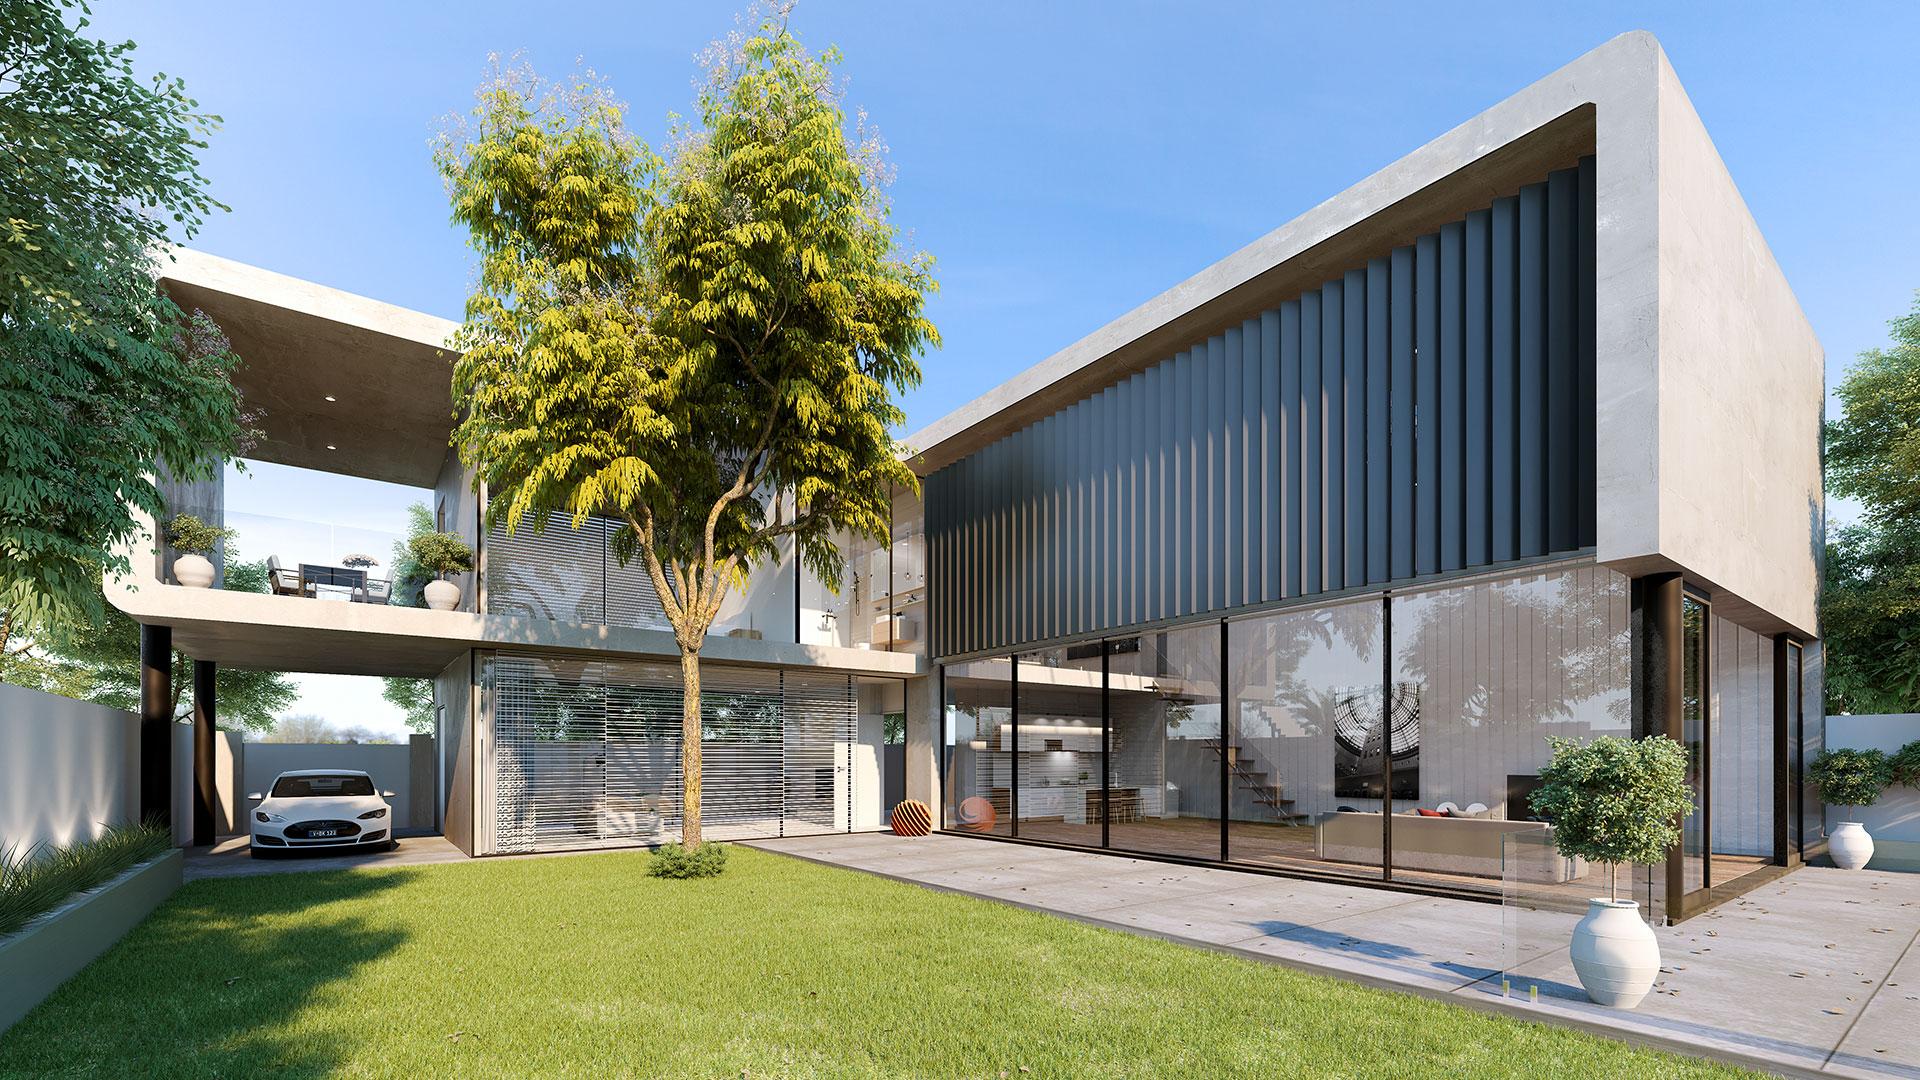 ArcViz_Artist_Impression_Architectural_Visualization_Melbourne.jpg